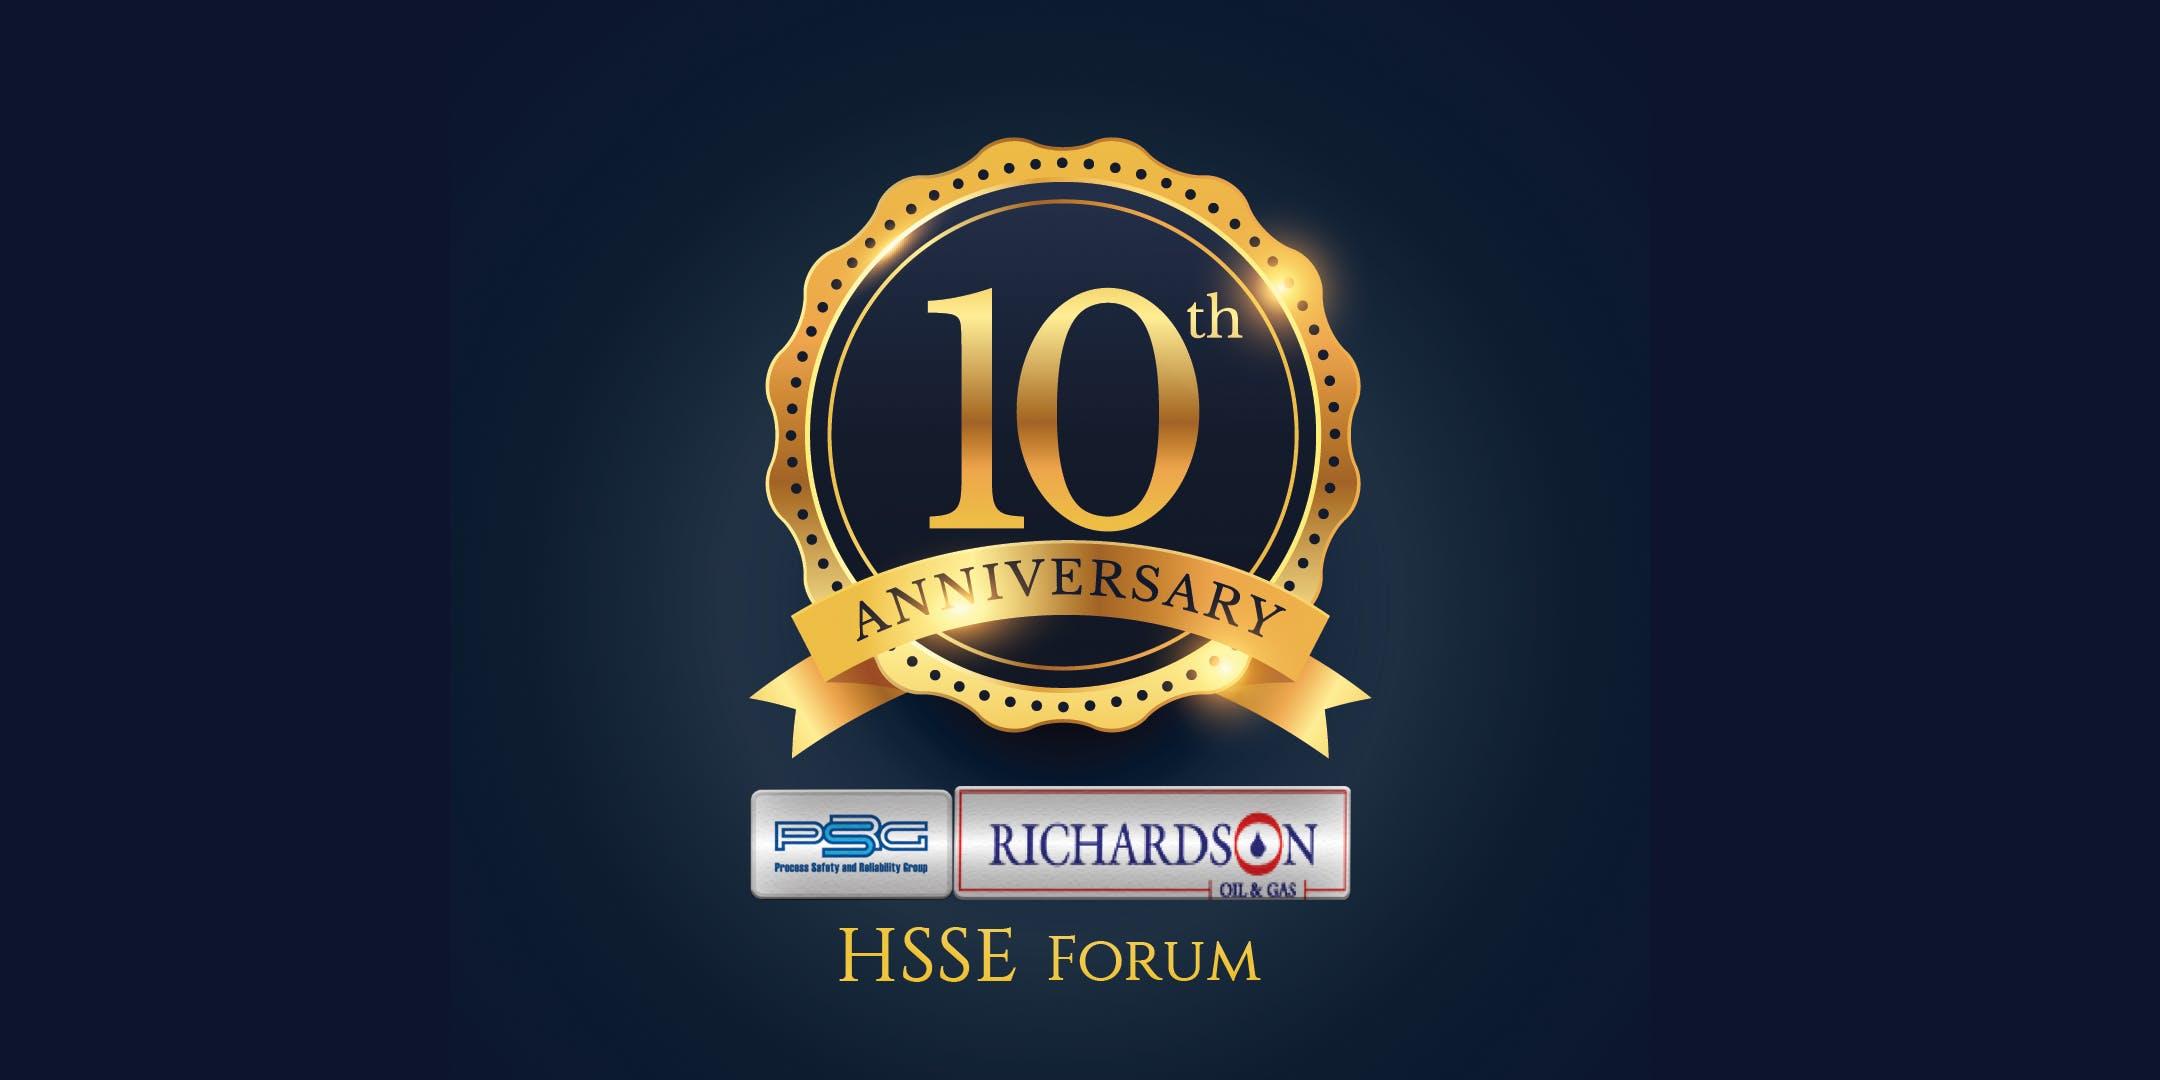 PSRG-RICHARDSON HSSE FORUM - 10TH ANNIVERSARY